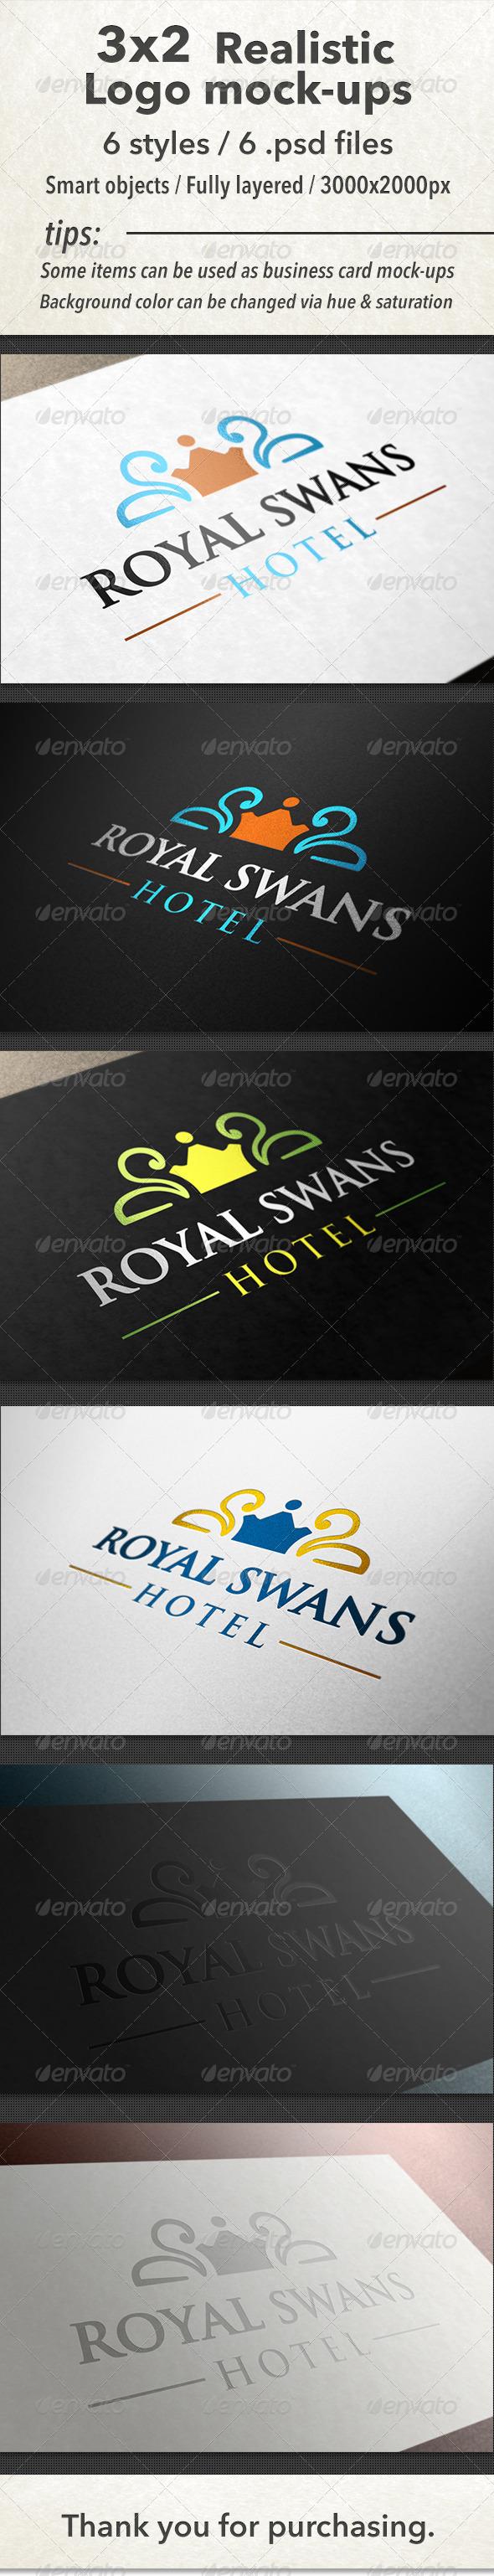 GraphicRiver 3x2 Realistic Logo Mock-Ups 4547133